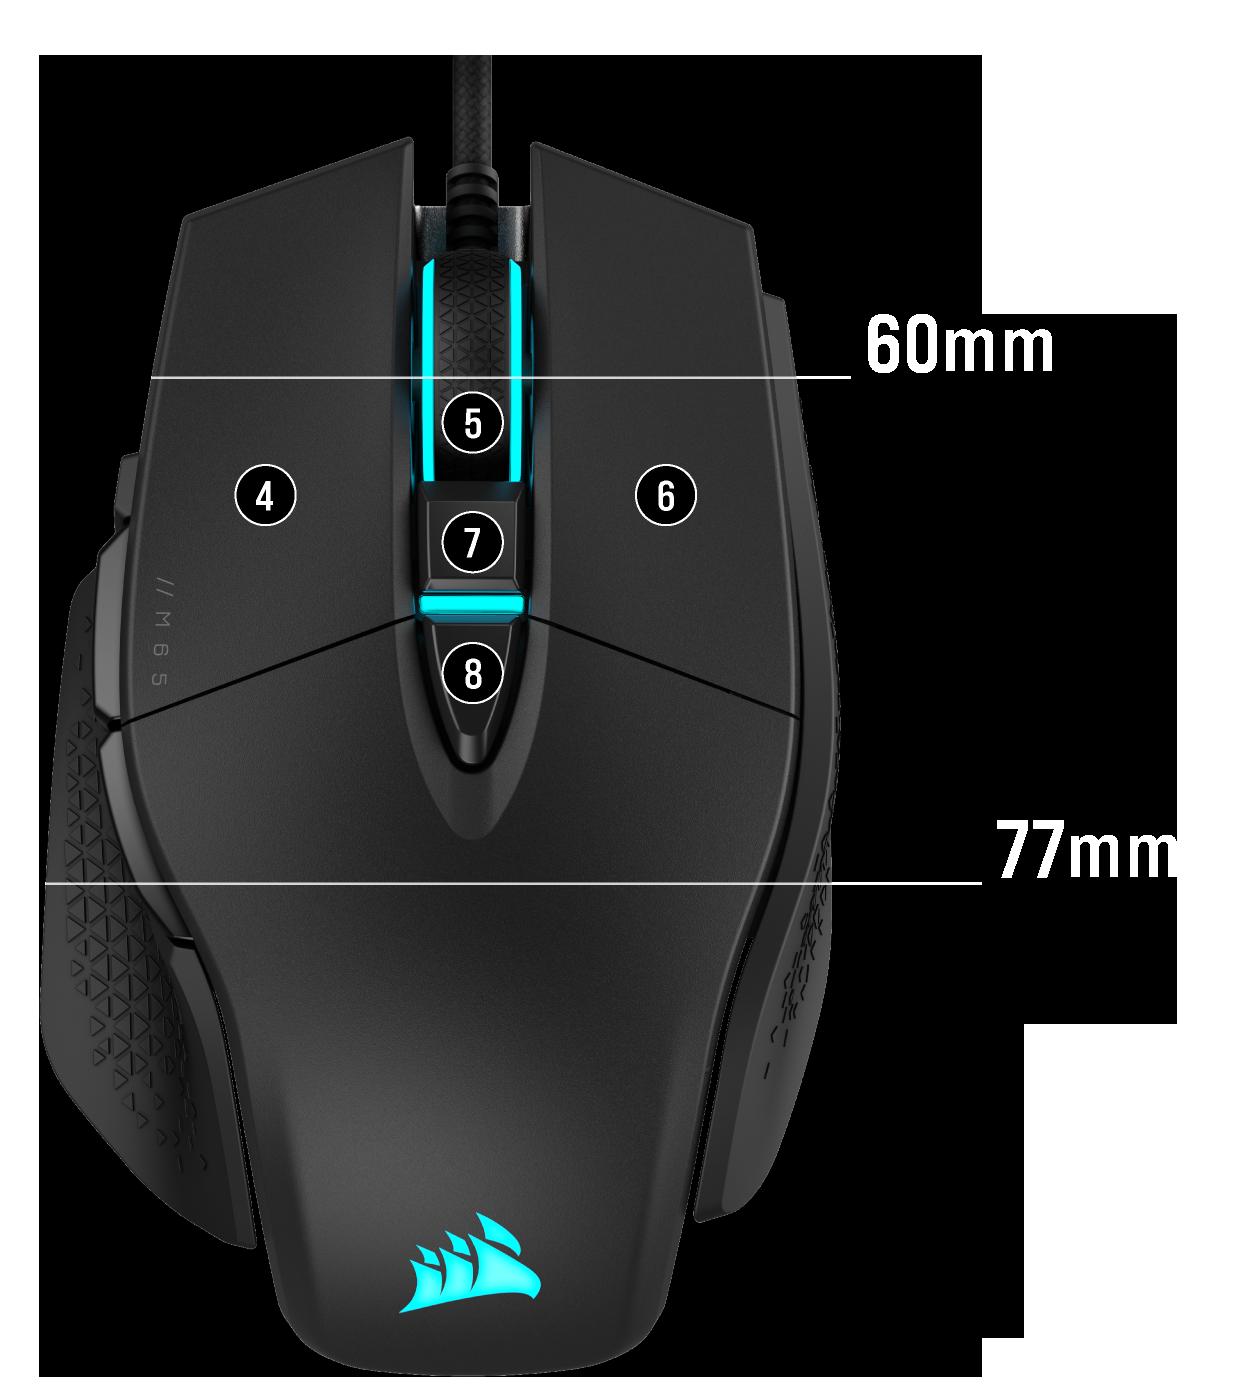 M65 Mouse Dimensions